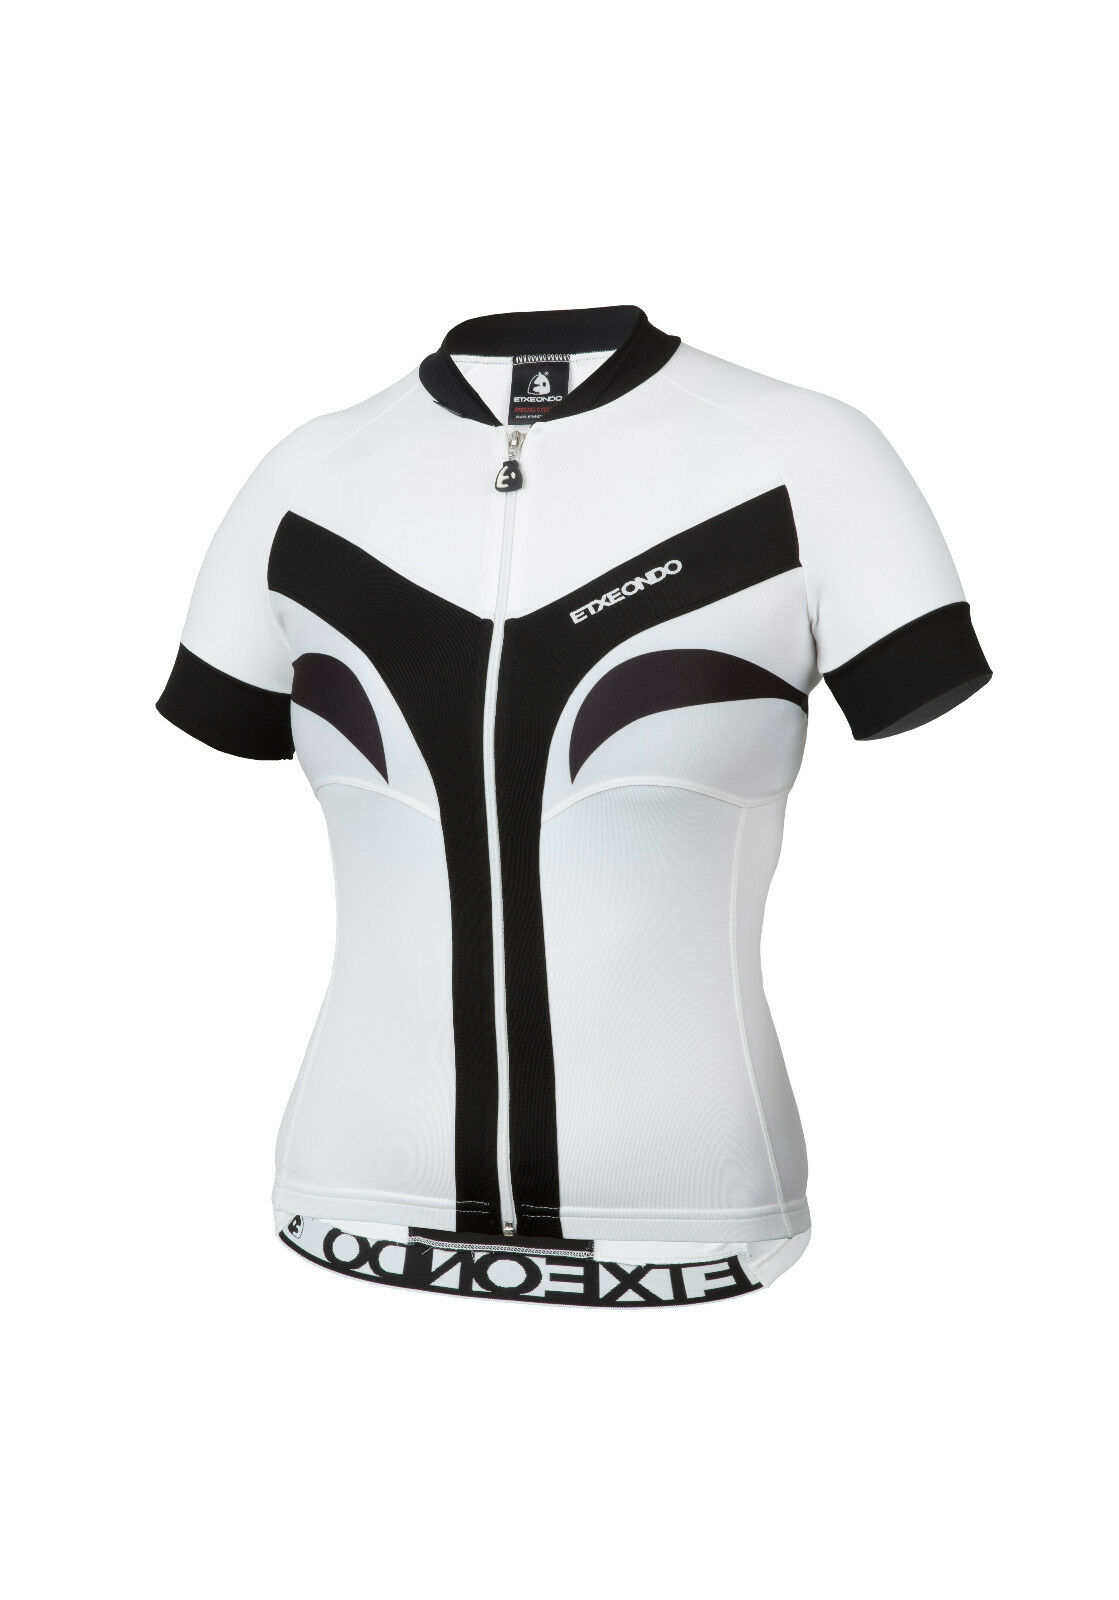 Para Mujer Etxeondo Aroa Tx Manga Corta Ciclismo Jersey Jersey Jersey De Color blancooo (30222) 5eb78d